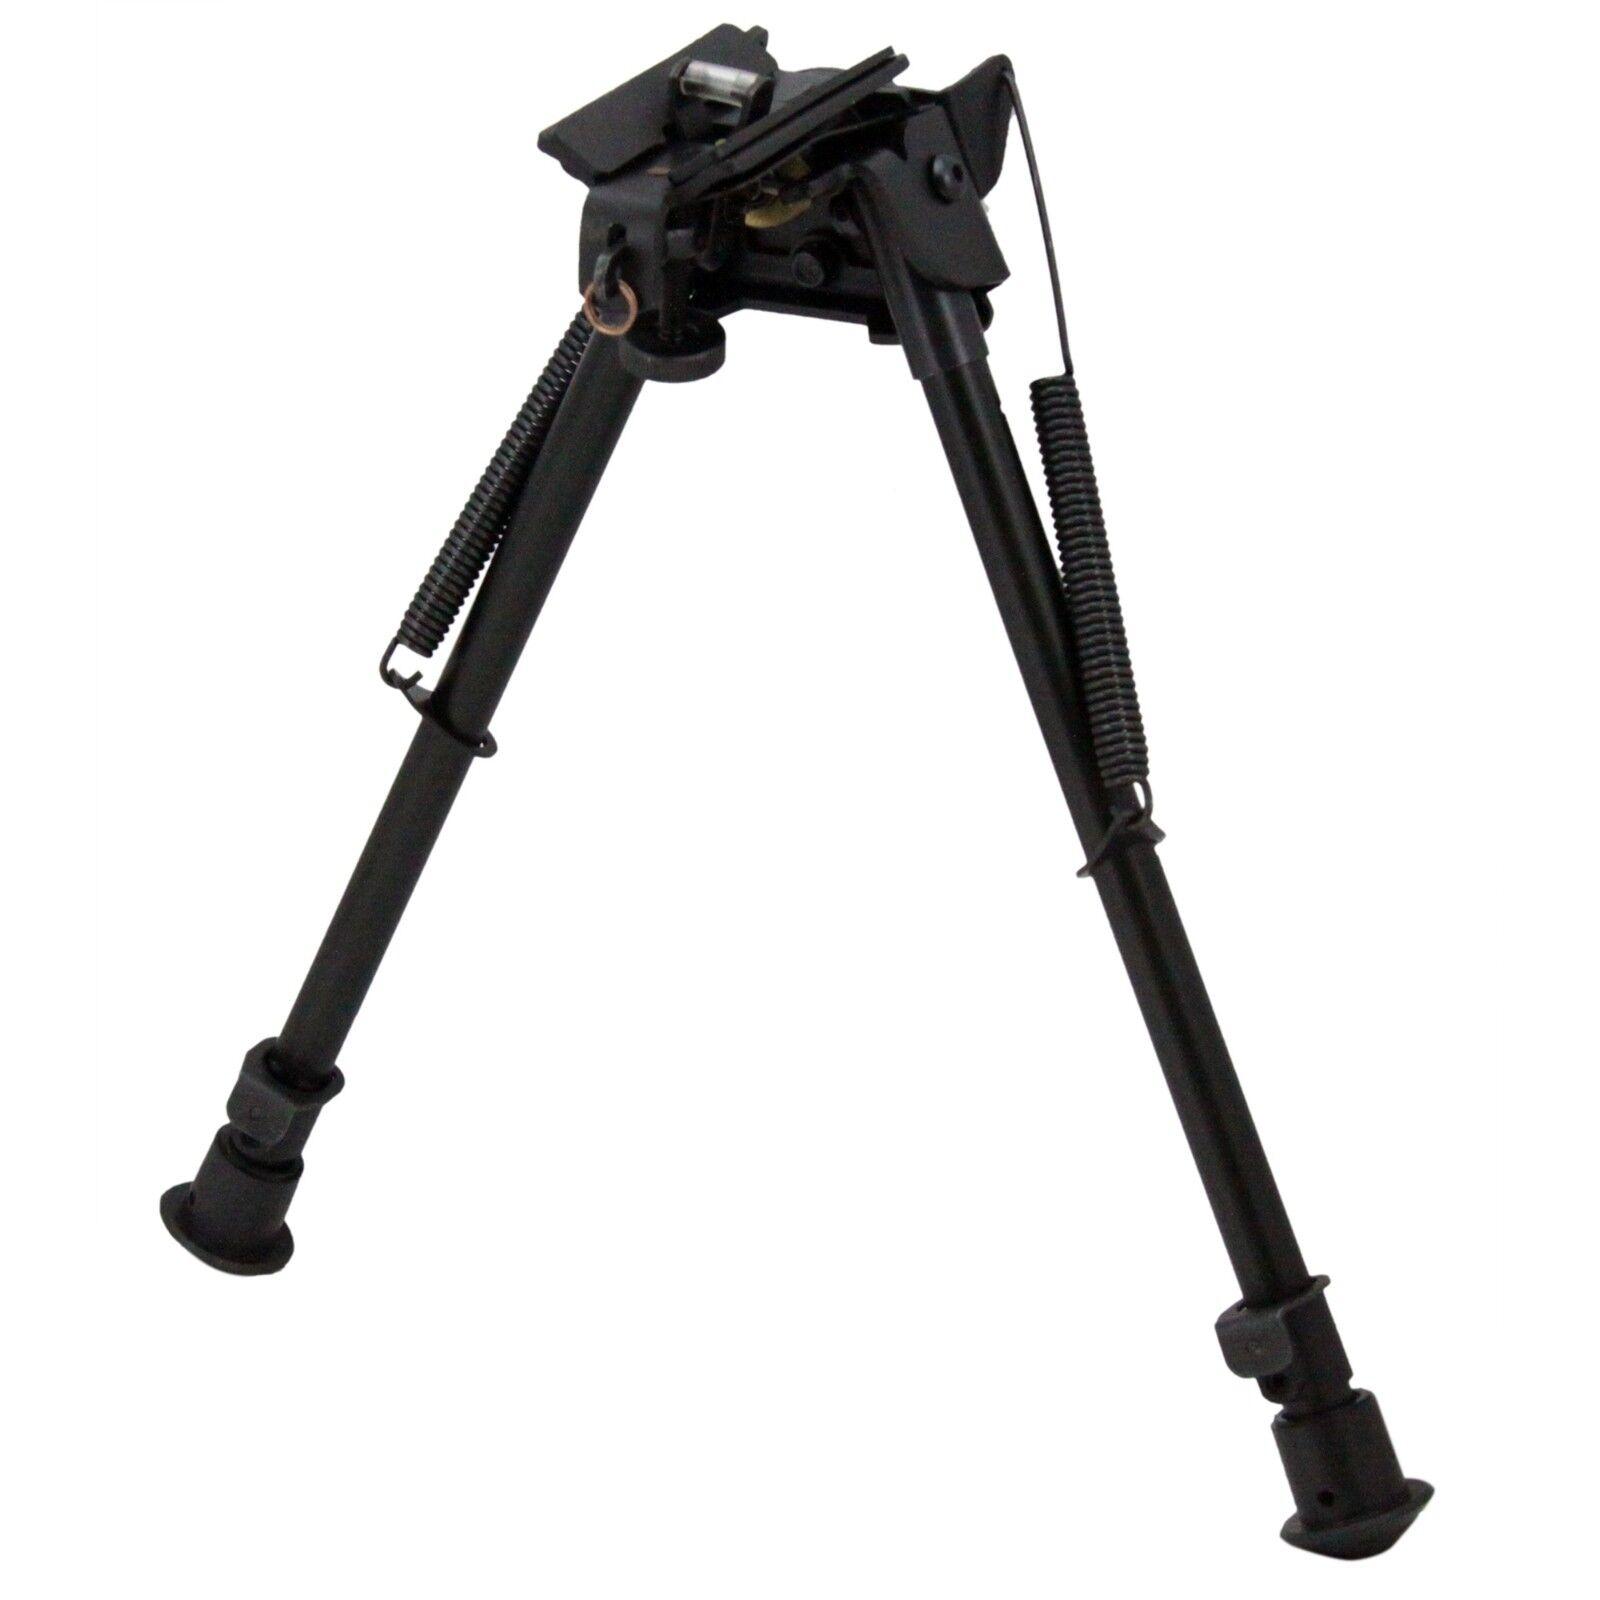 CCOP USA 13  Swivel Tilts Mount Harris Style Bipod Spring Return Legs BP-29AL